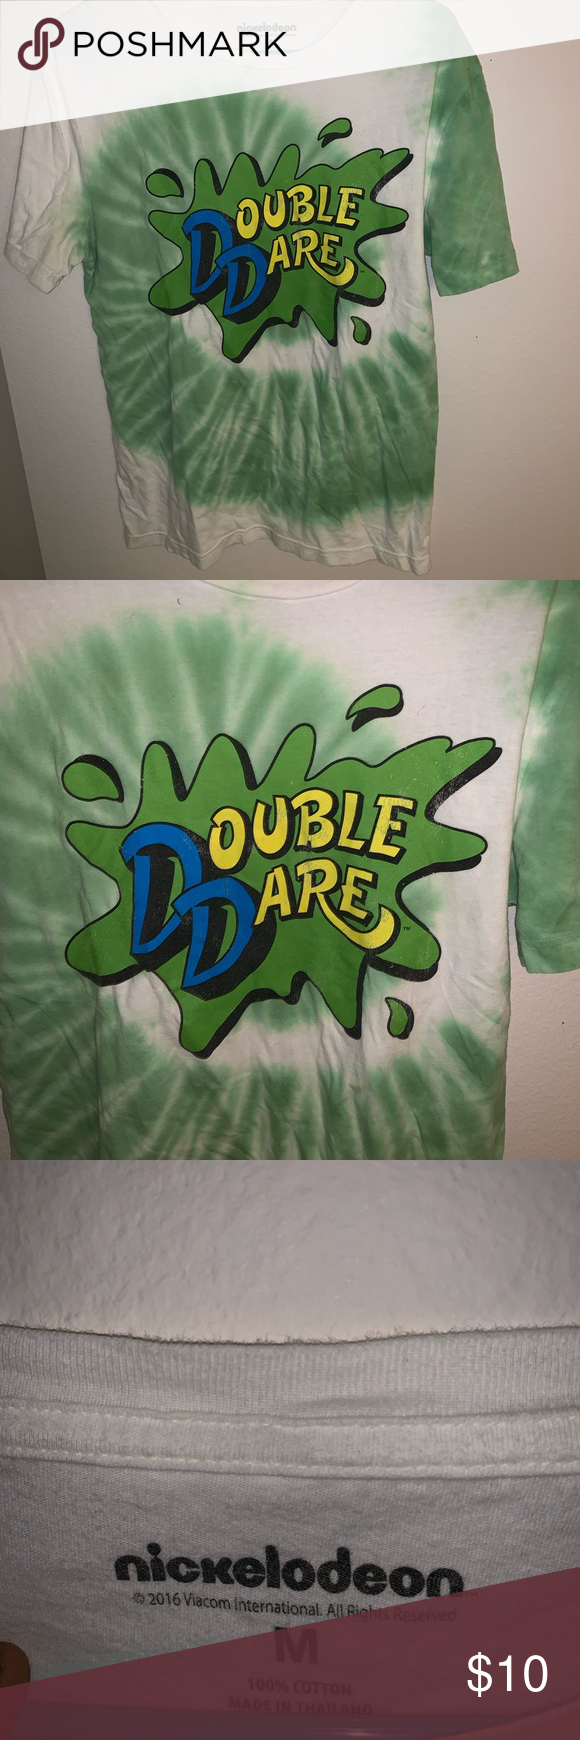 I Just Added This Listing On Poshmark Nickelodeon Double Dare T Shirt Shopmycloset Poshmark Fashion Shopping Style Dare T Shirt Double Dare Nickelodeon